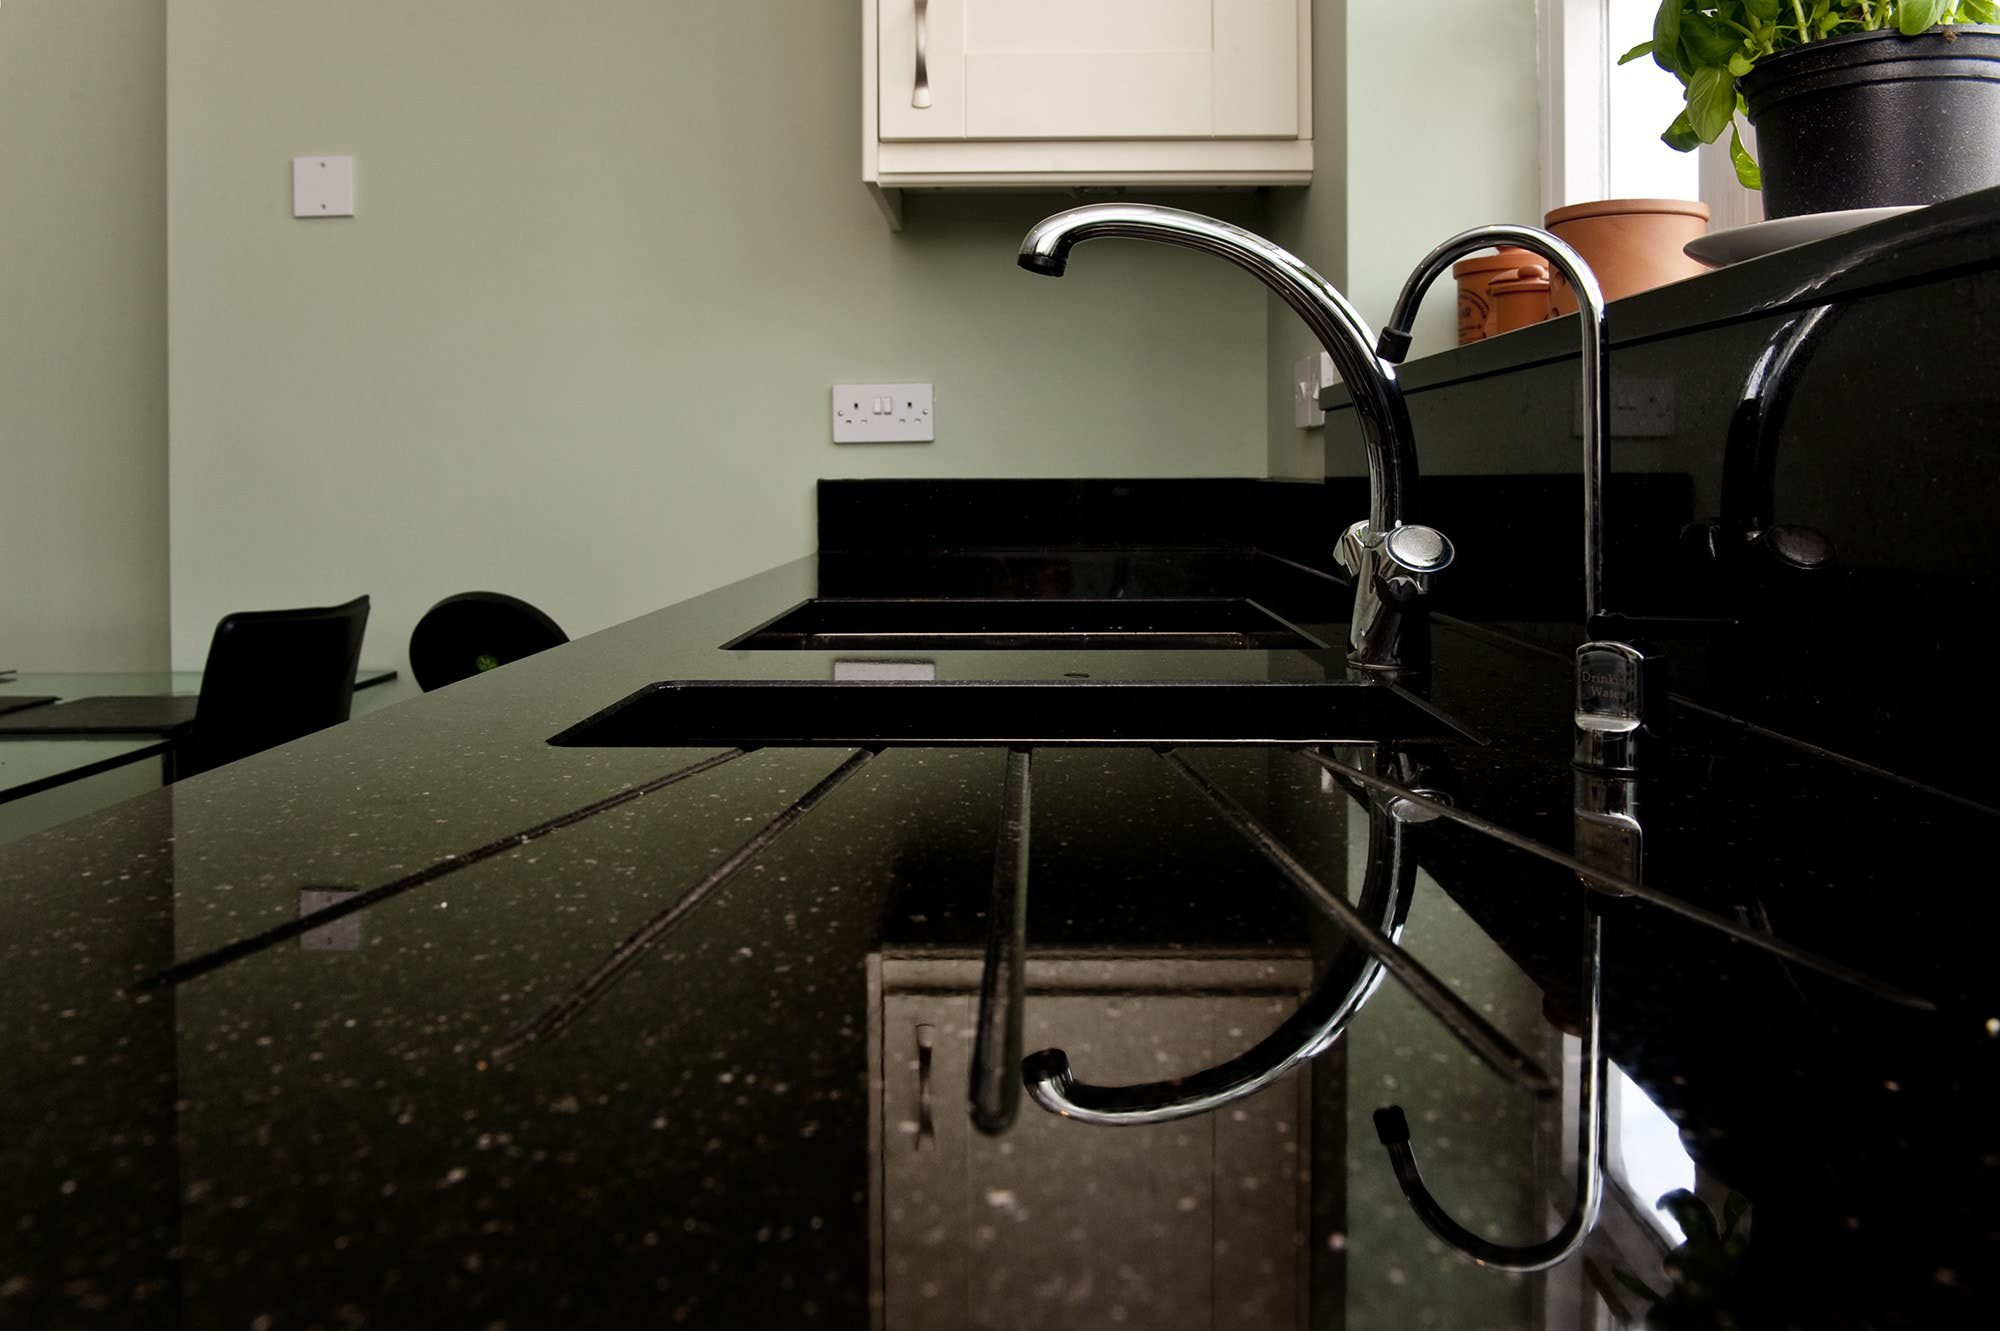 black-galaxy-granite-south-croydon-104551-a-draiange-grooves-min